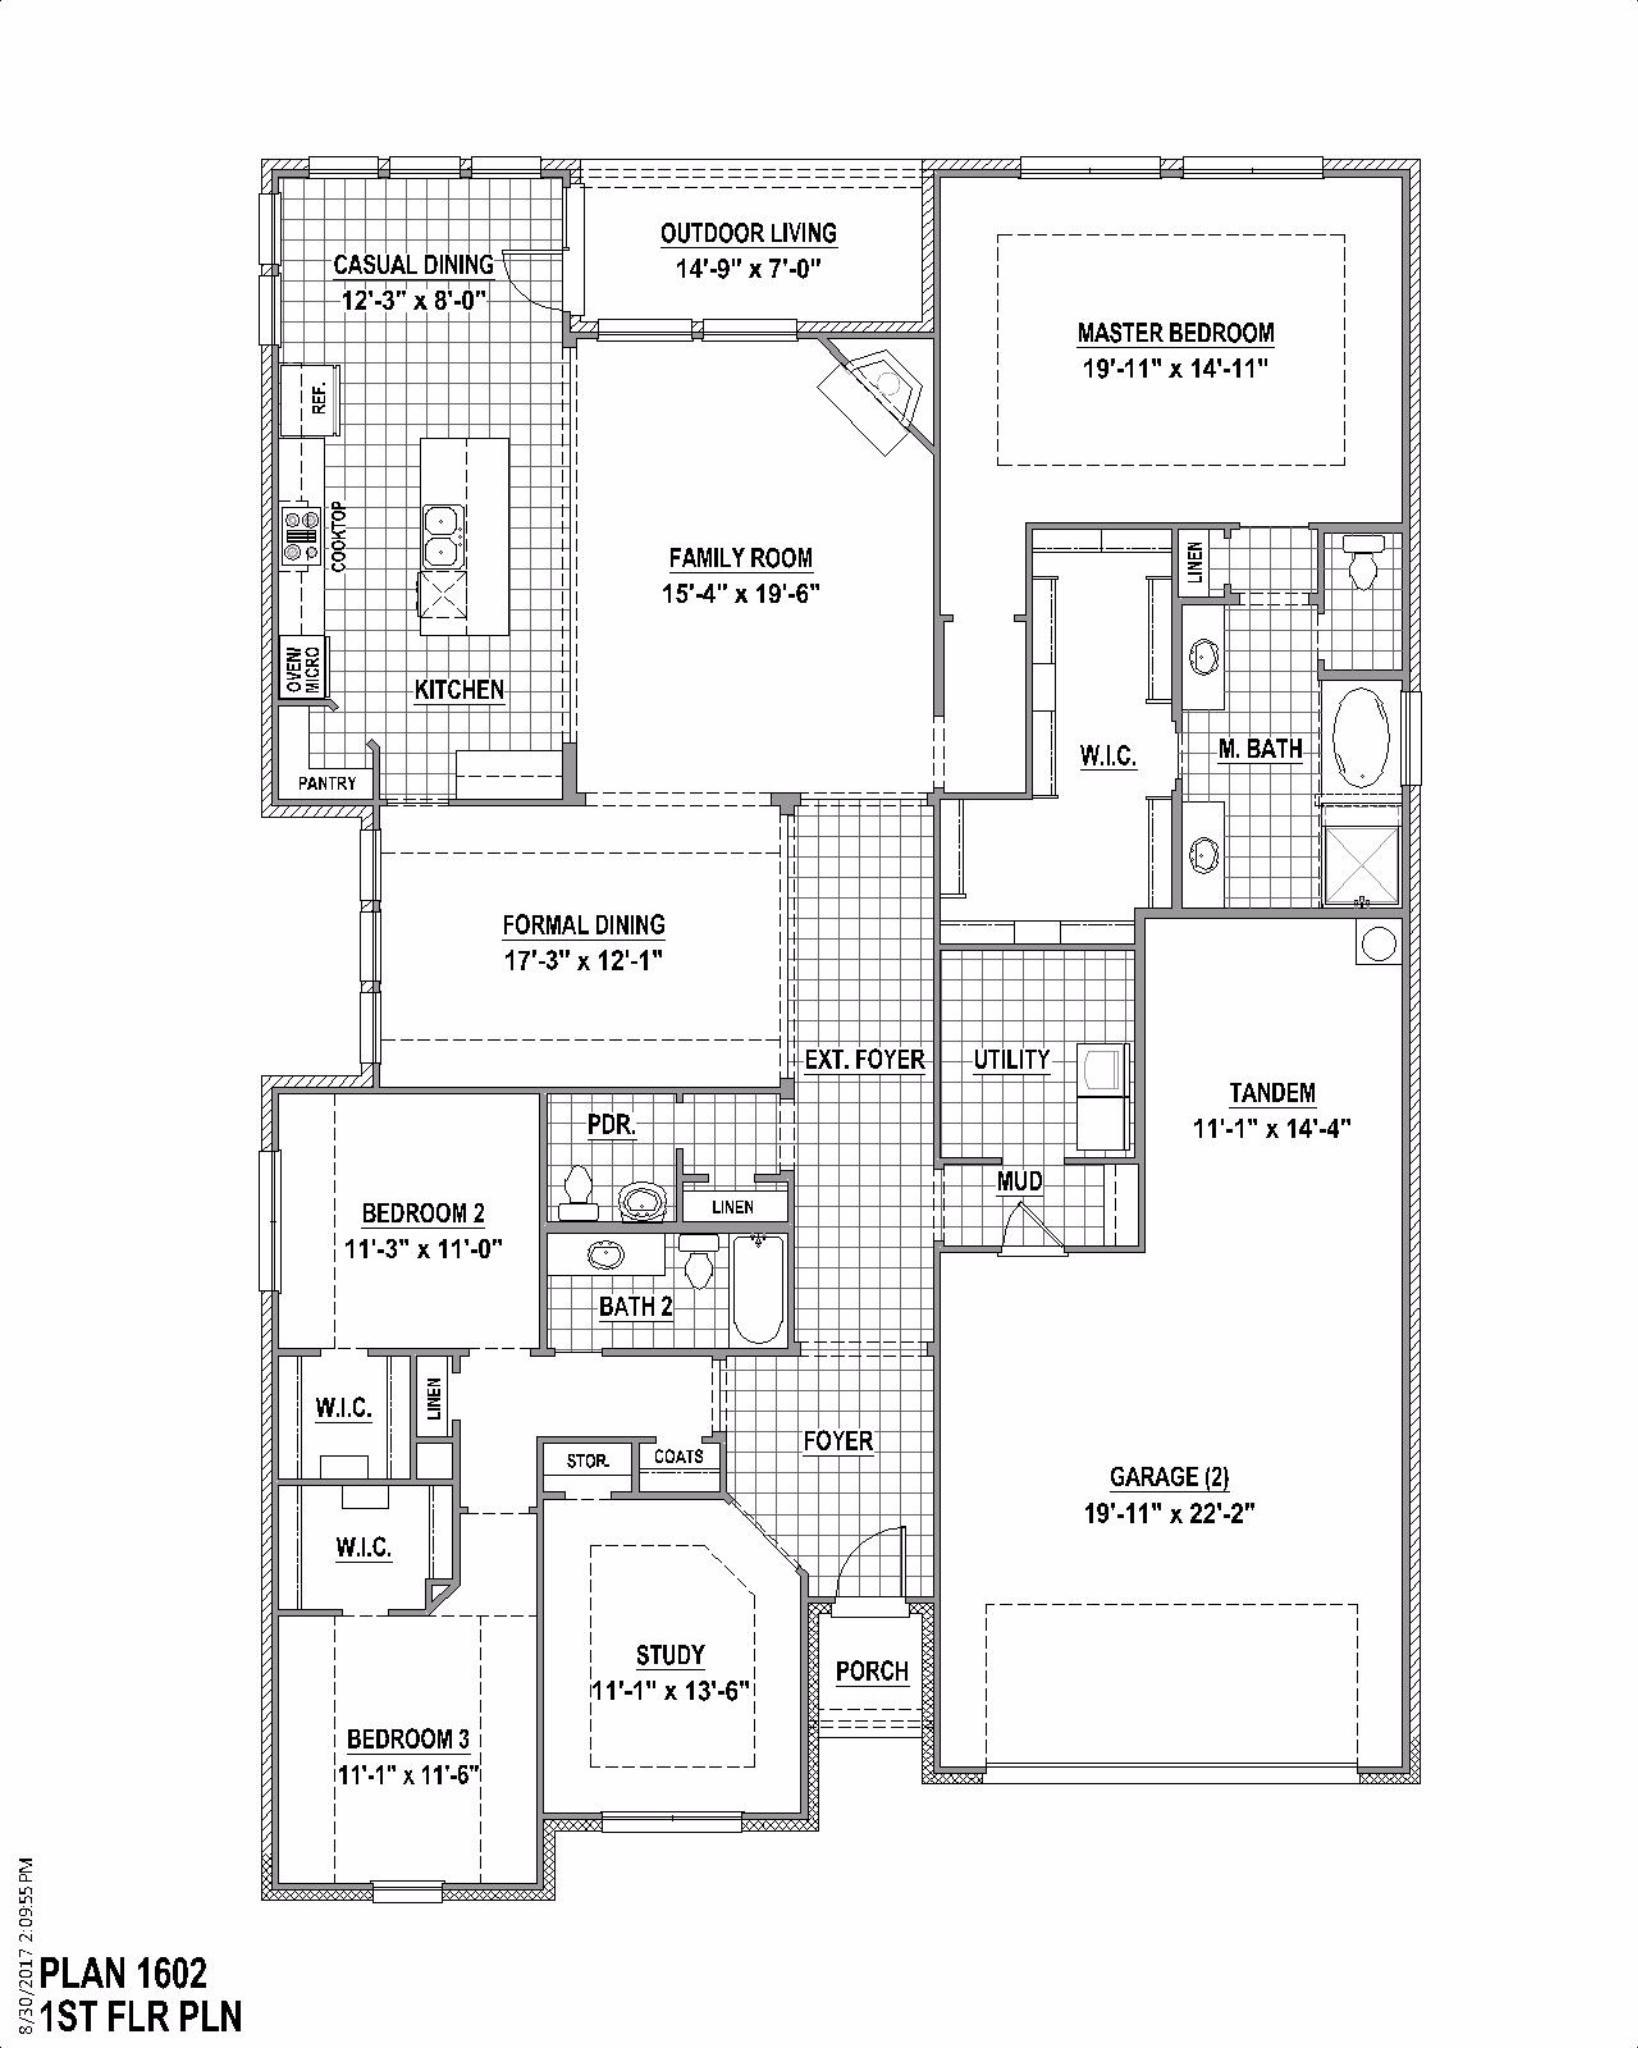 Plan 1602 Floor Plan